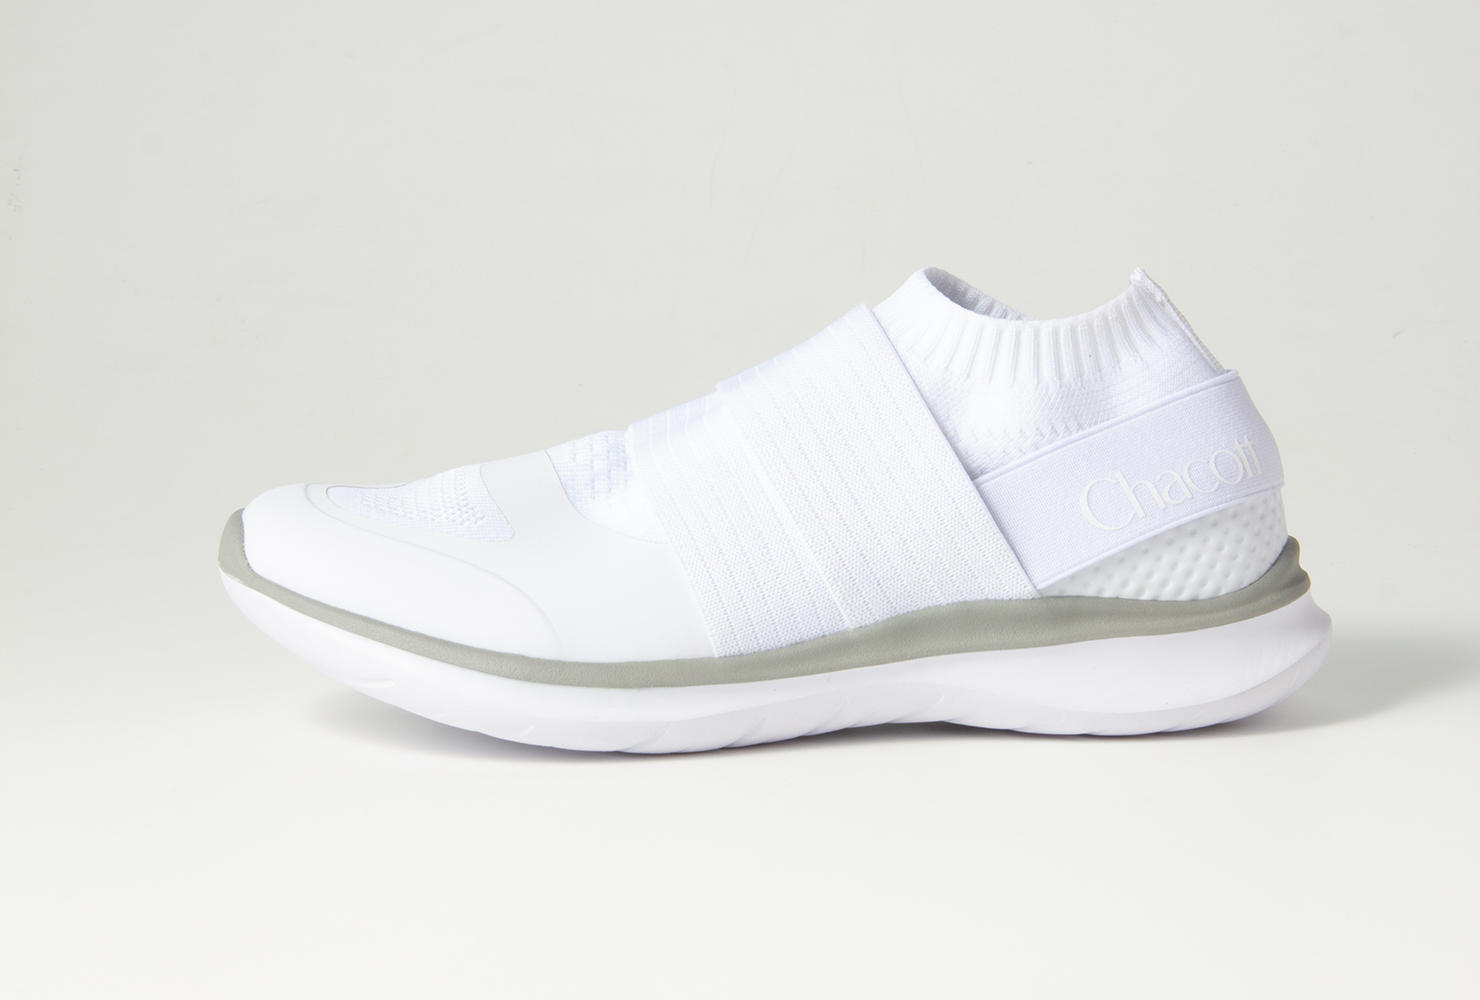 0417_sneakers_balance_01.jpg